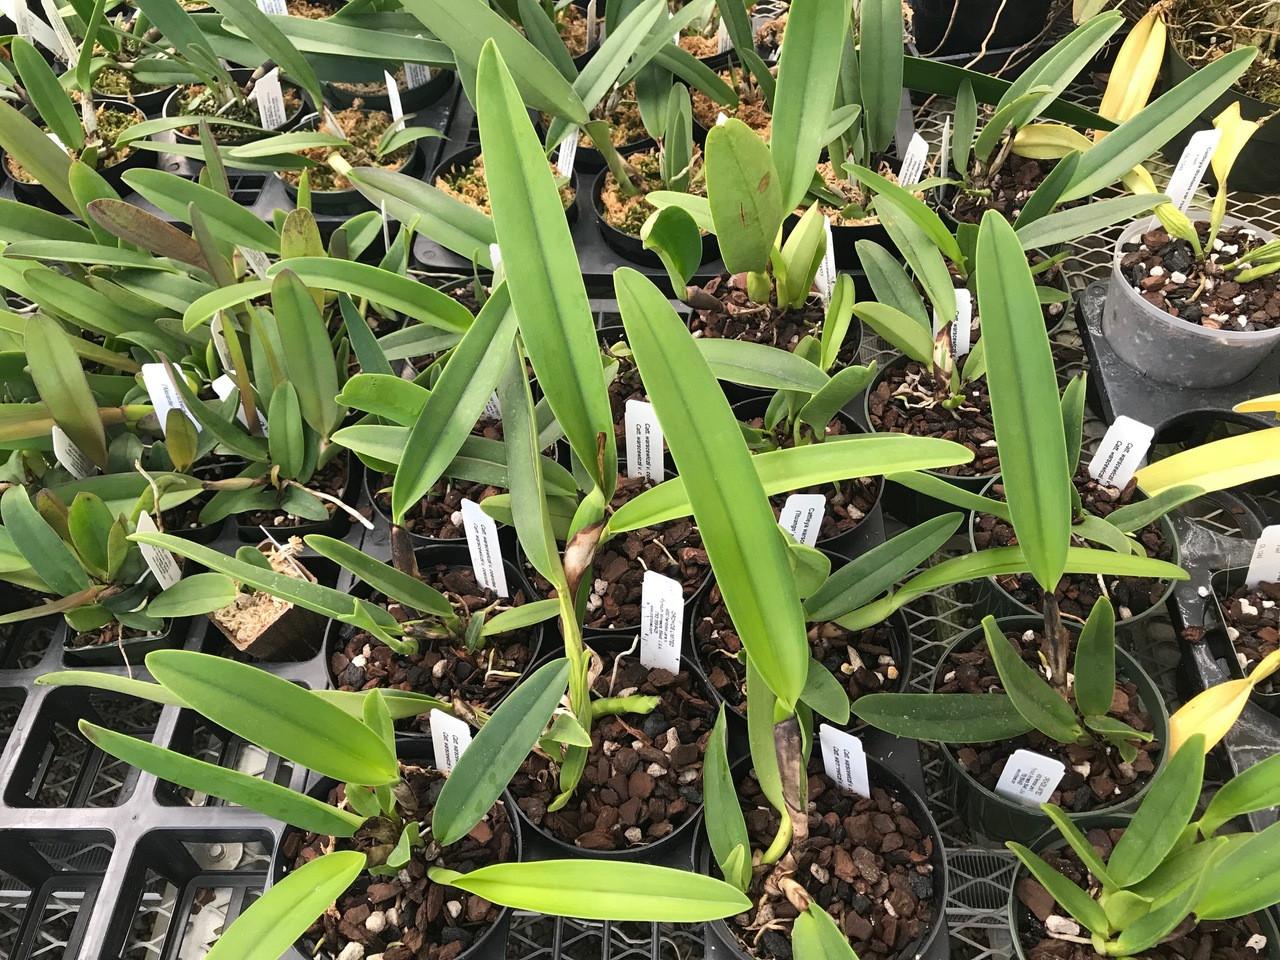 Cattleya warscewiczii var. coerulea ('Ituango' x 'SVO')